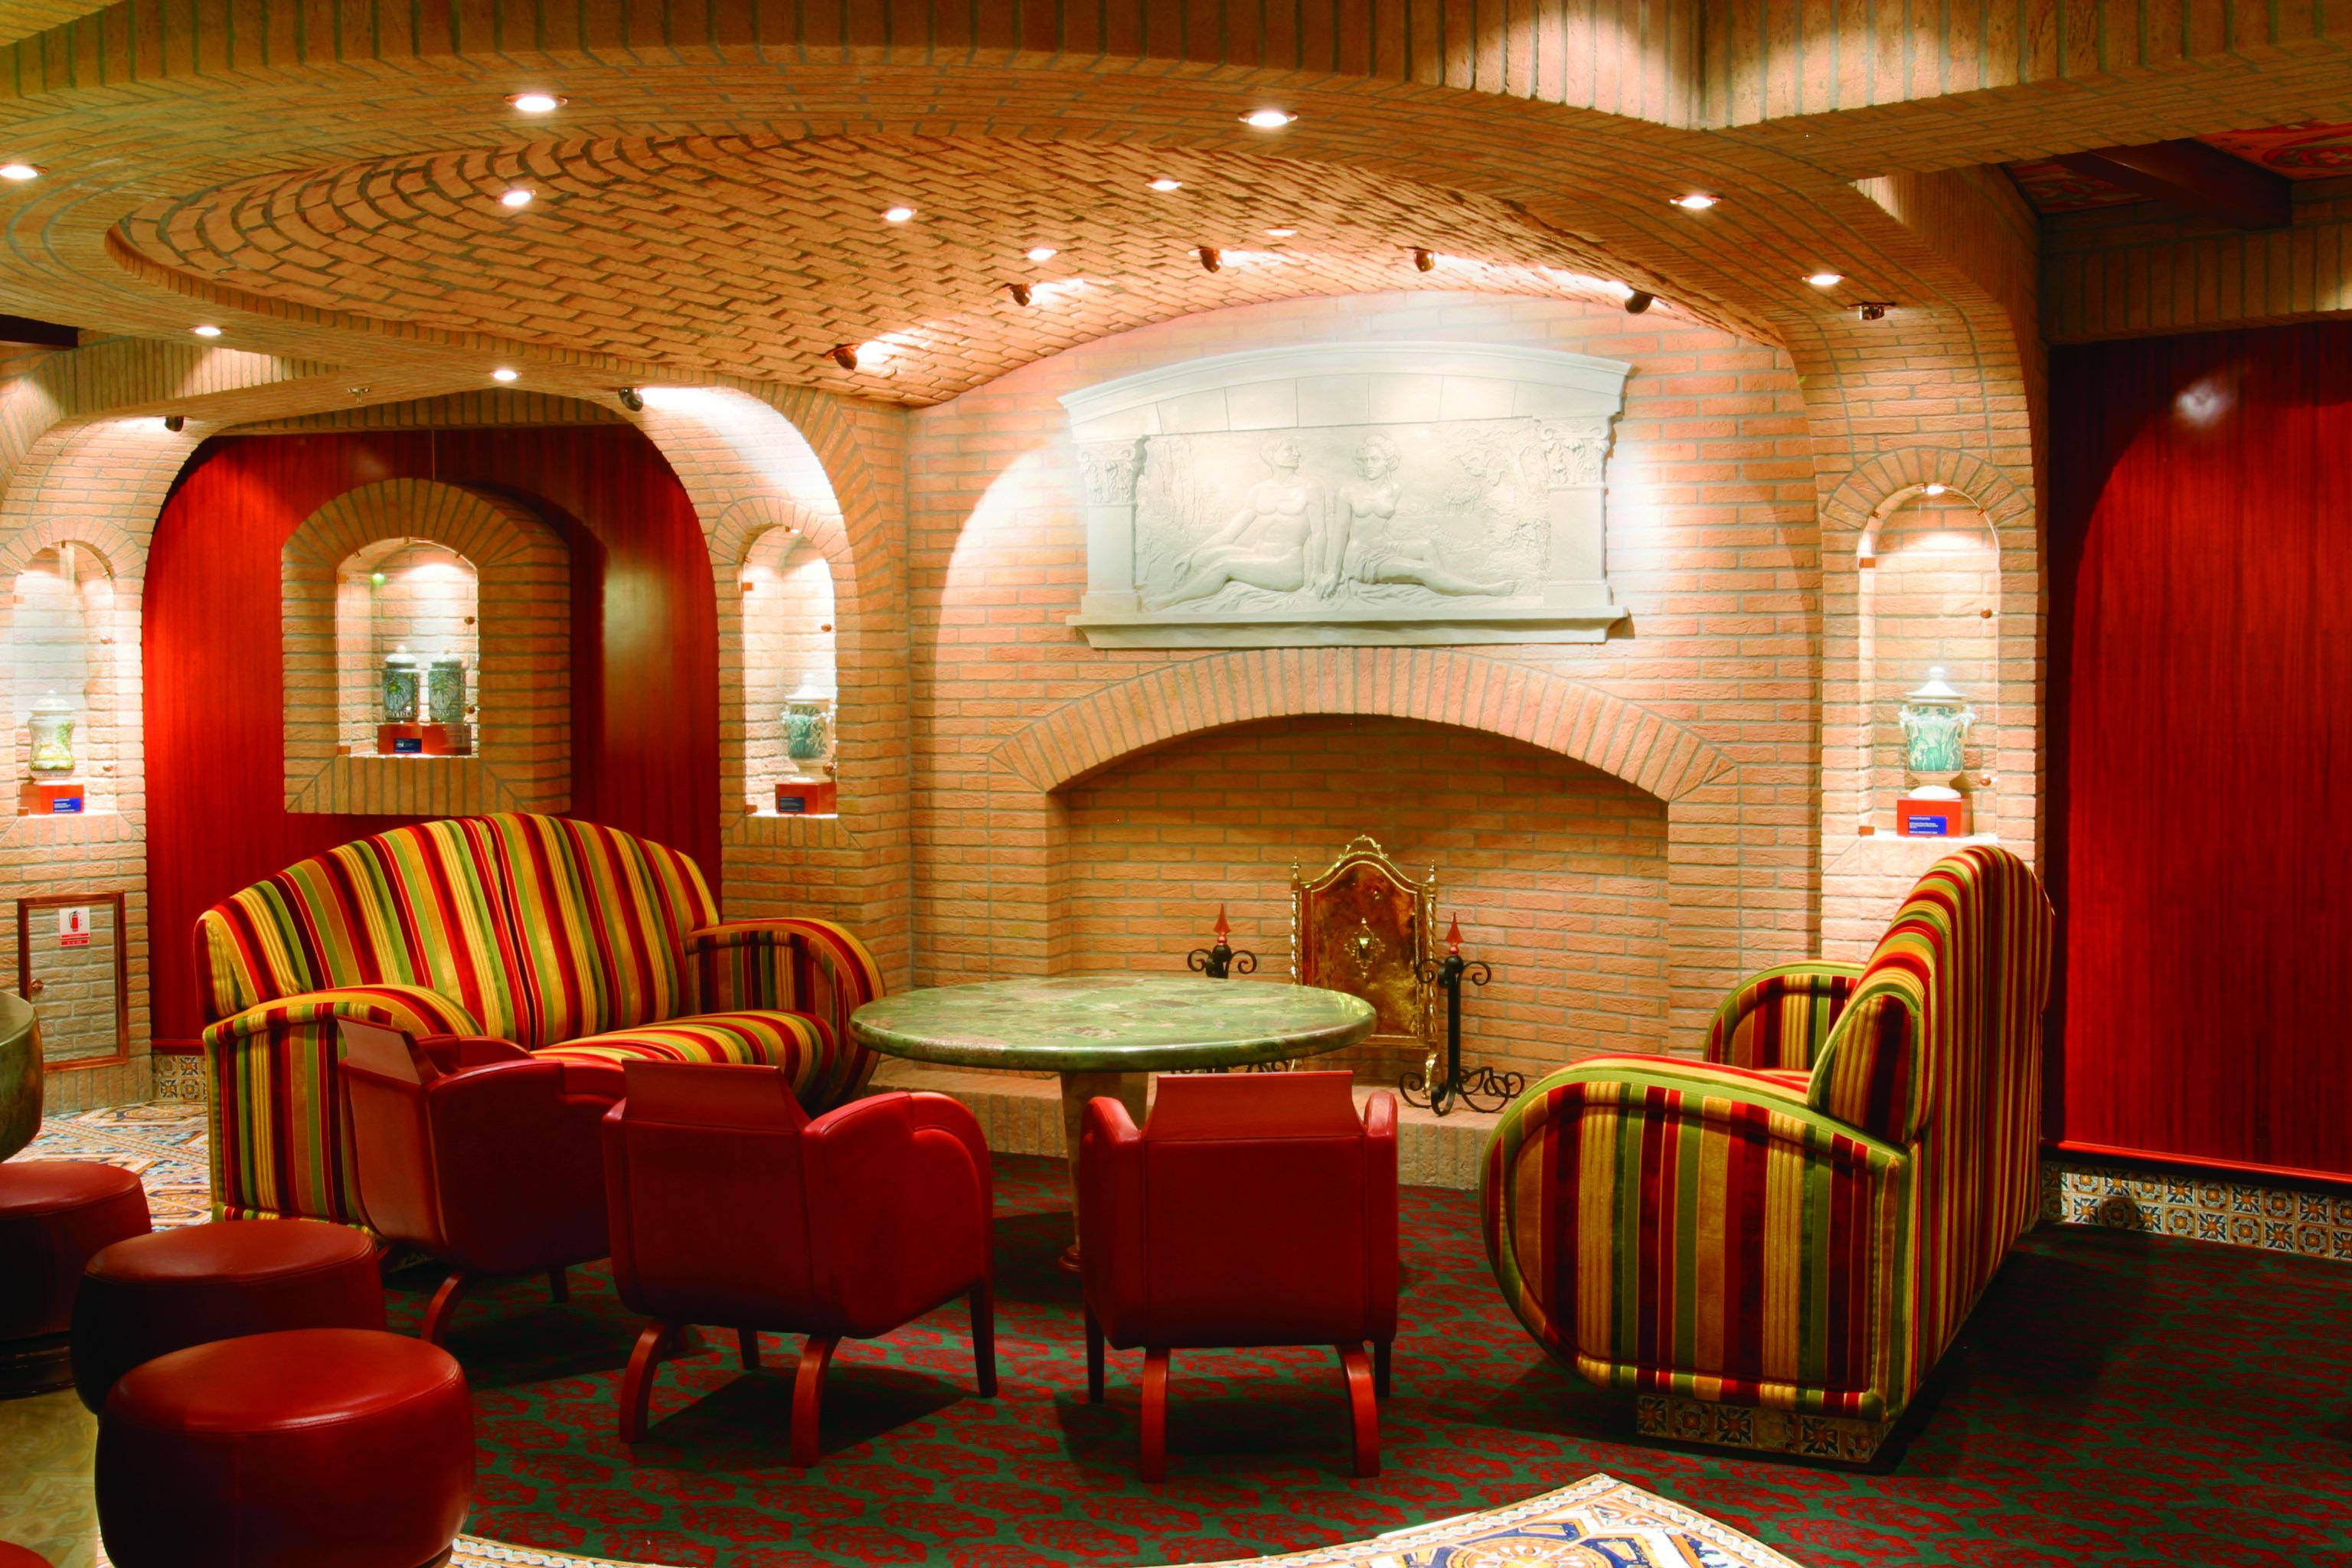 Costa Cruises Costa Magica Interior Bar Classico l'Aquila.jpg